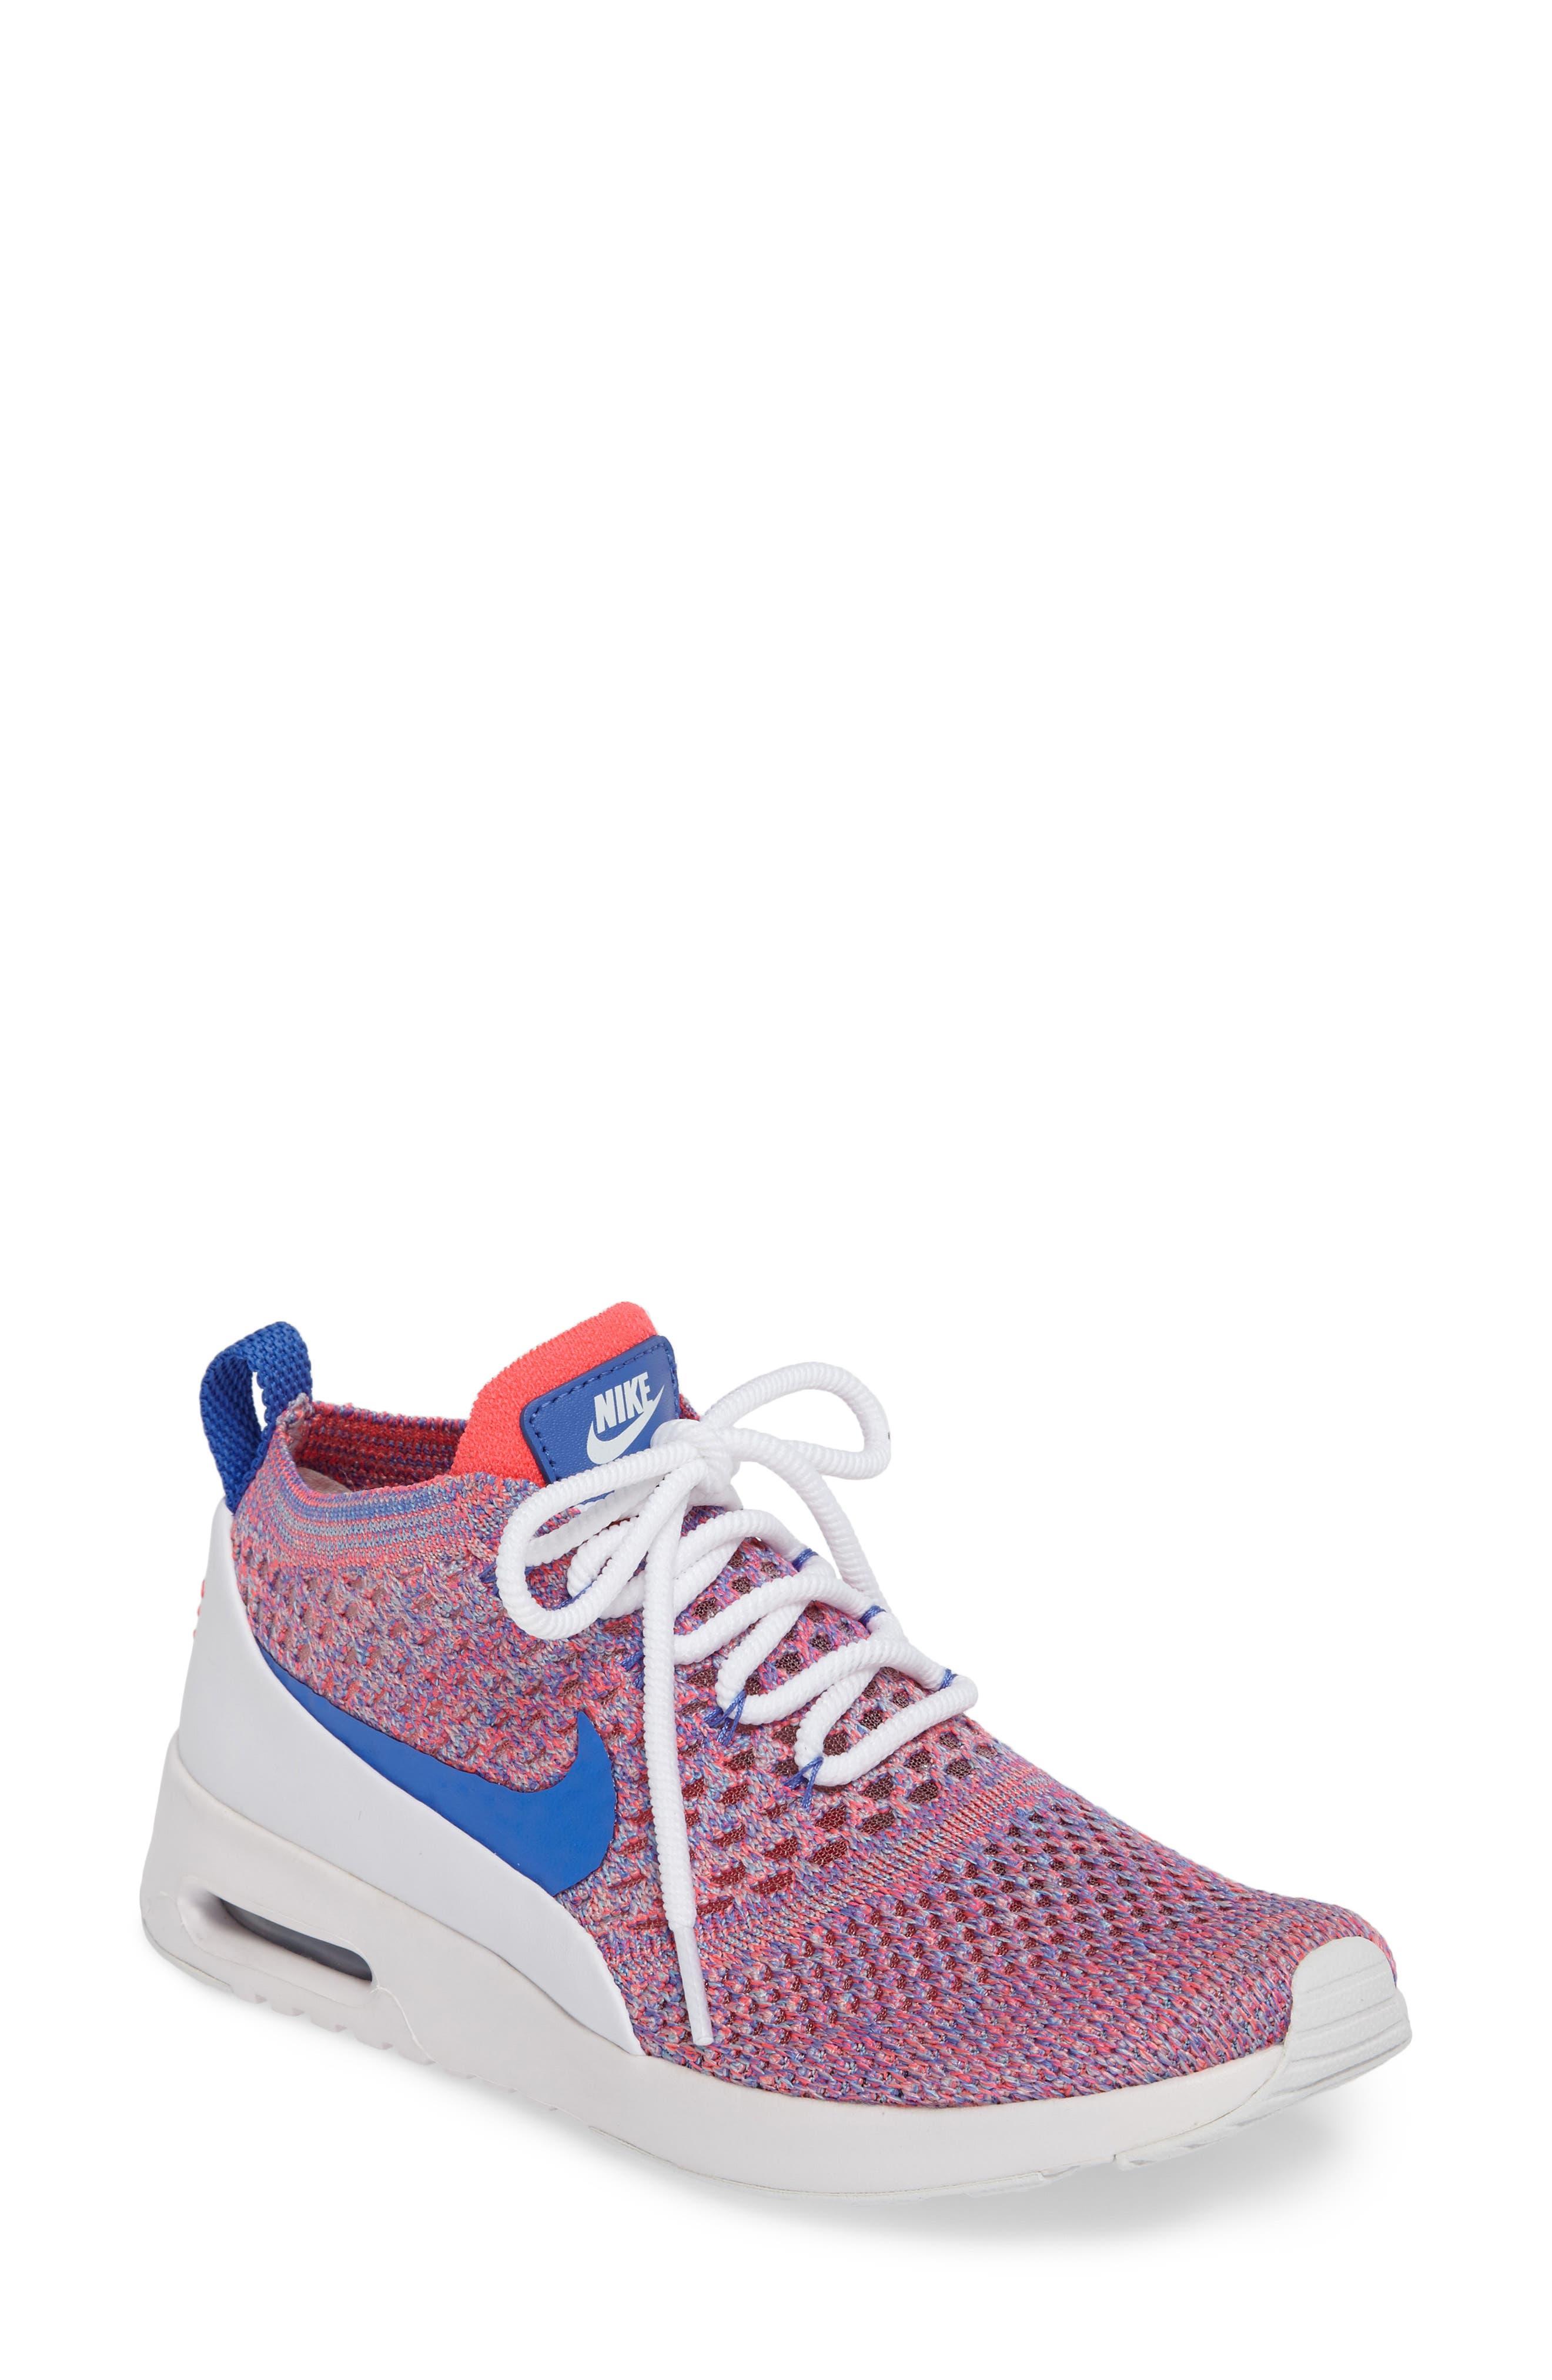 Air Max Thea Ultra Flyknit Sneaker,                             Main thumbnail 12, color,